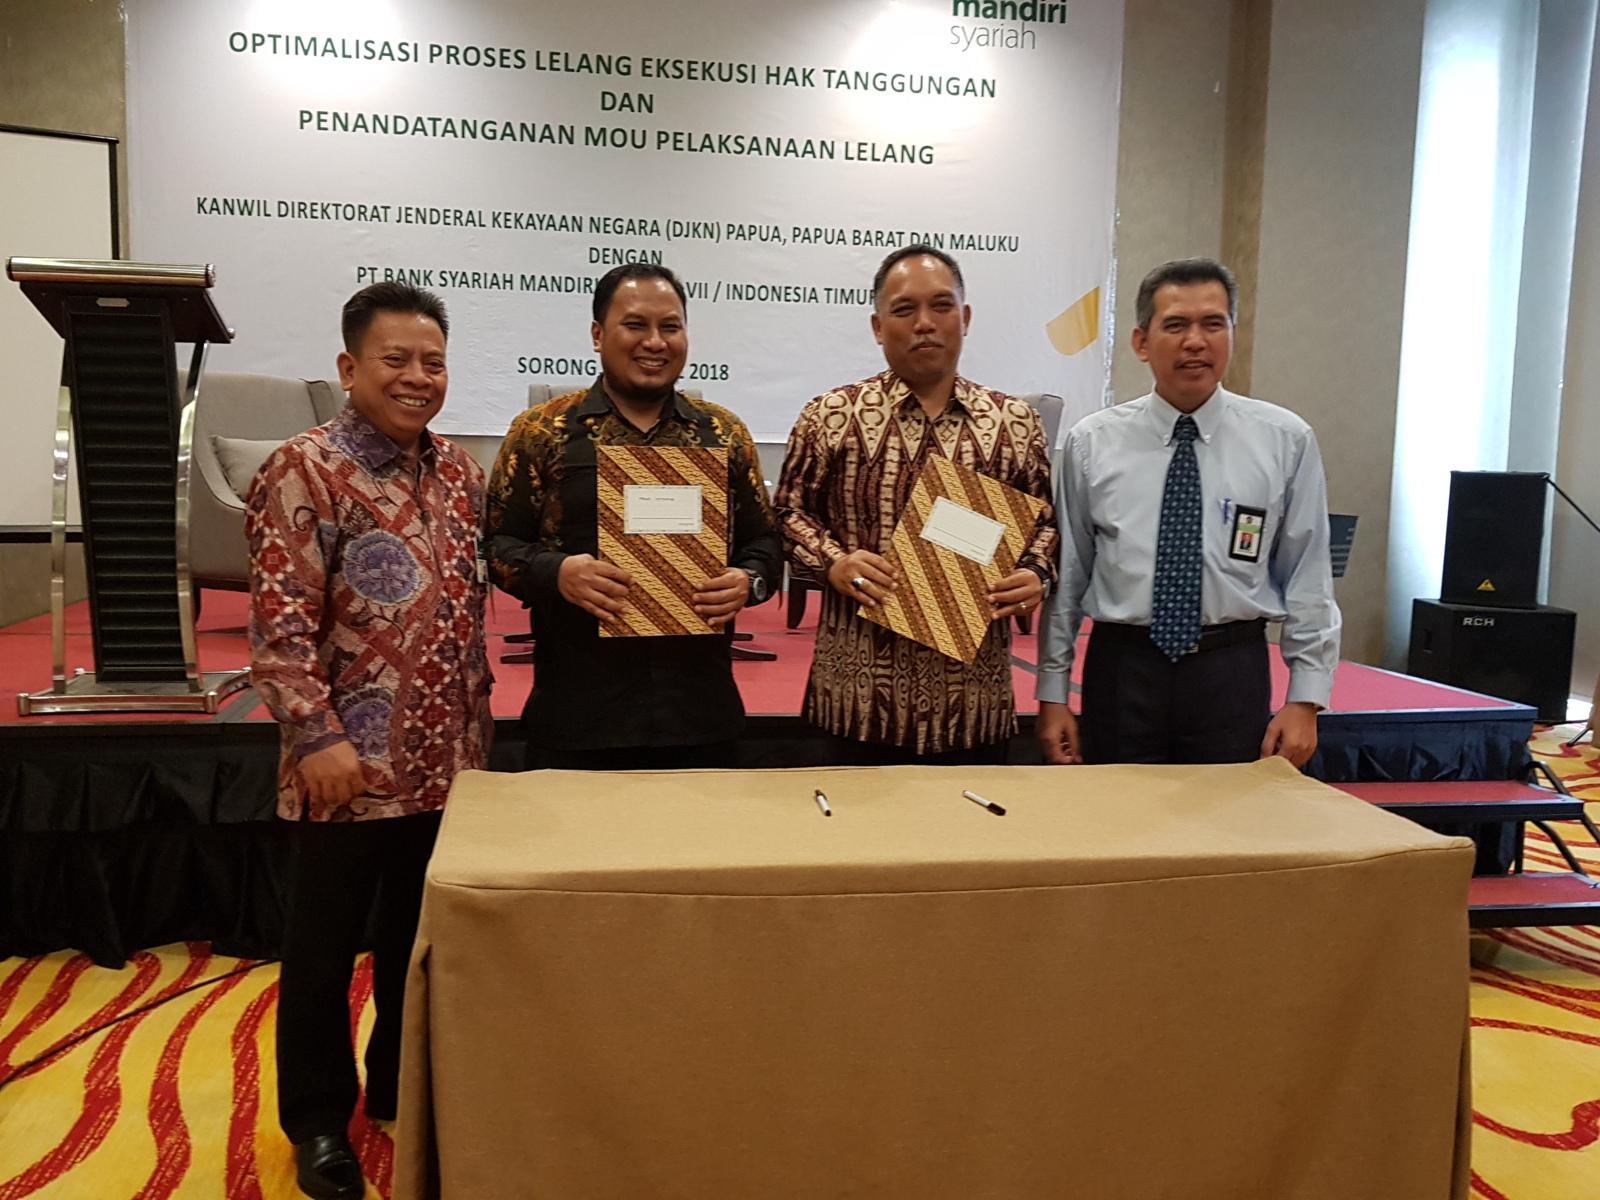 Amunisi Baru Kanwil DJKN Papua, Papua Barat dan Maluku Menggapai Target Kinerja Lelang tahun 2018